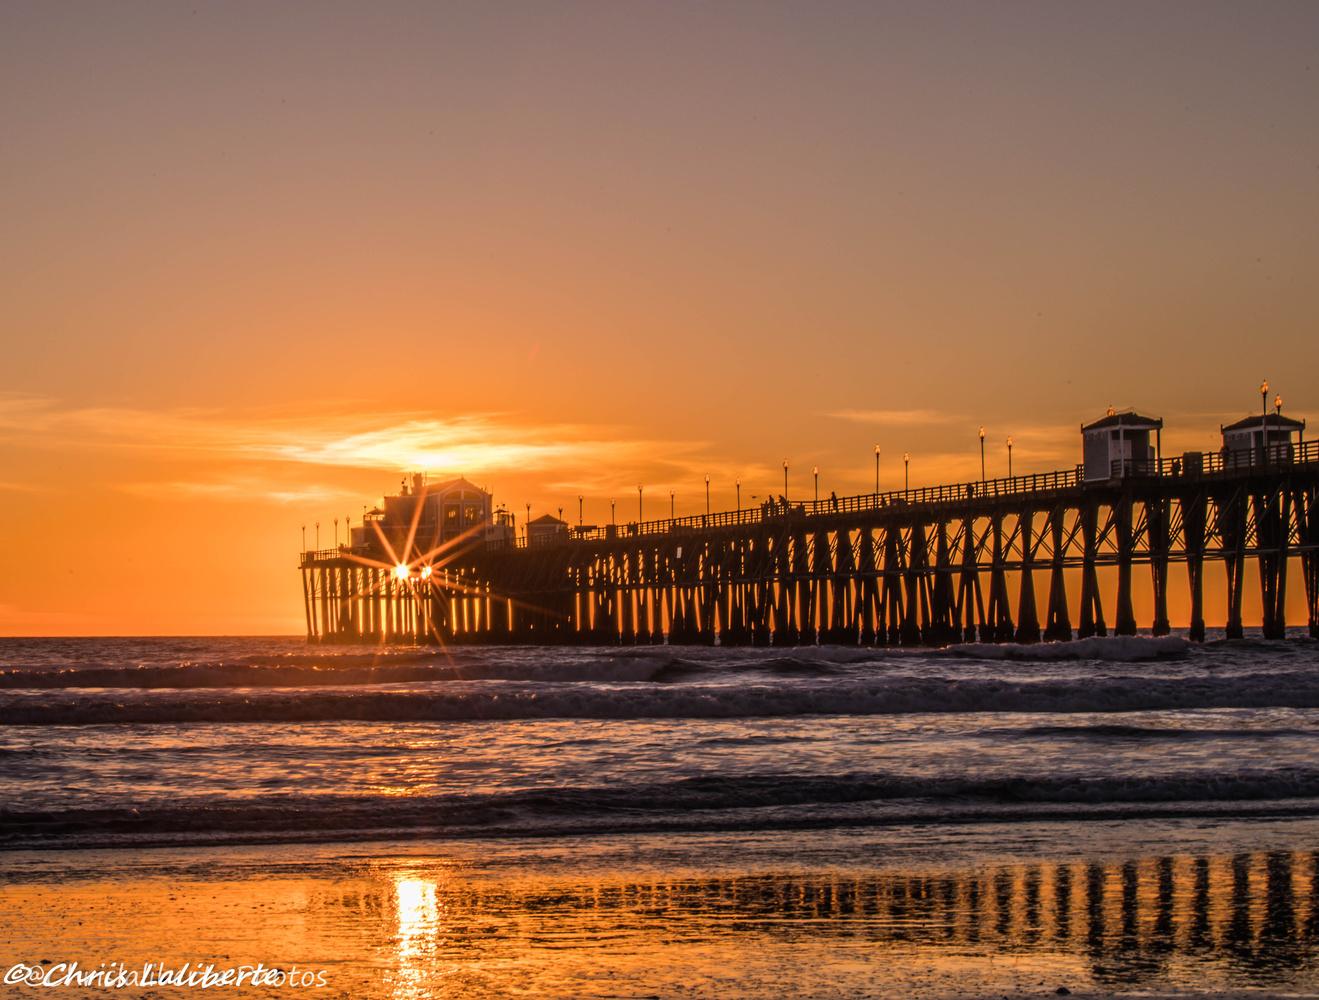 Pier Sunset by Christopher Laliberte